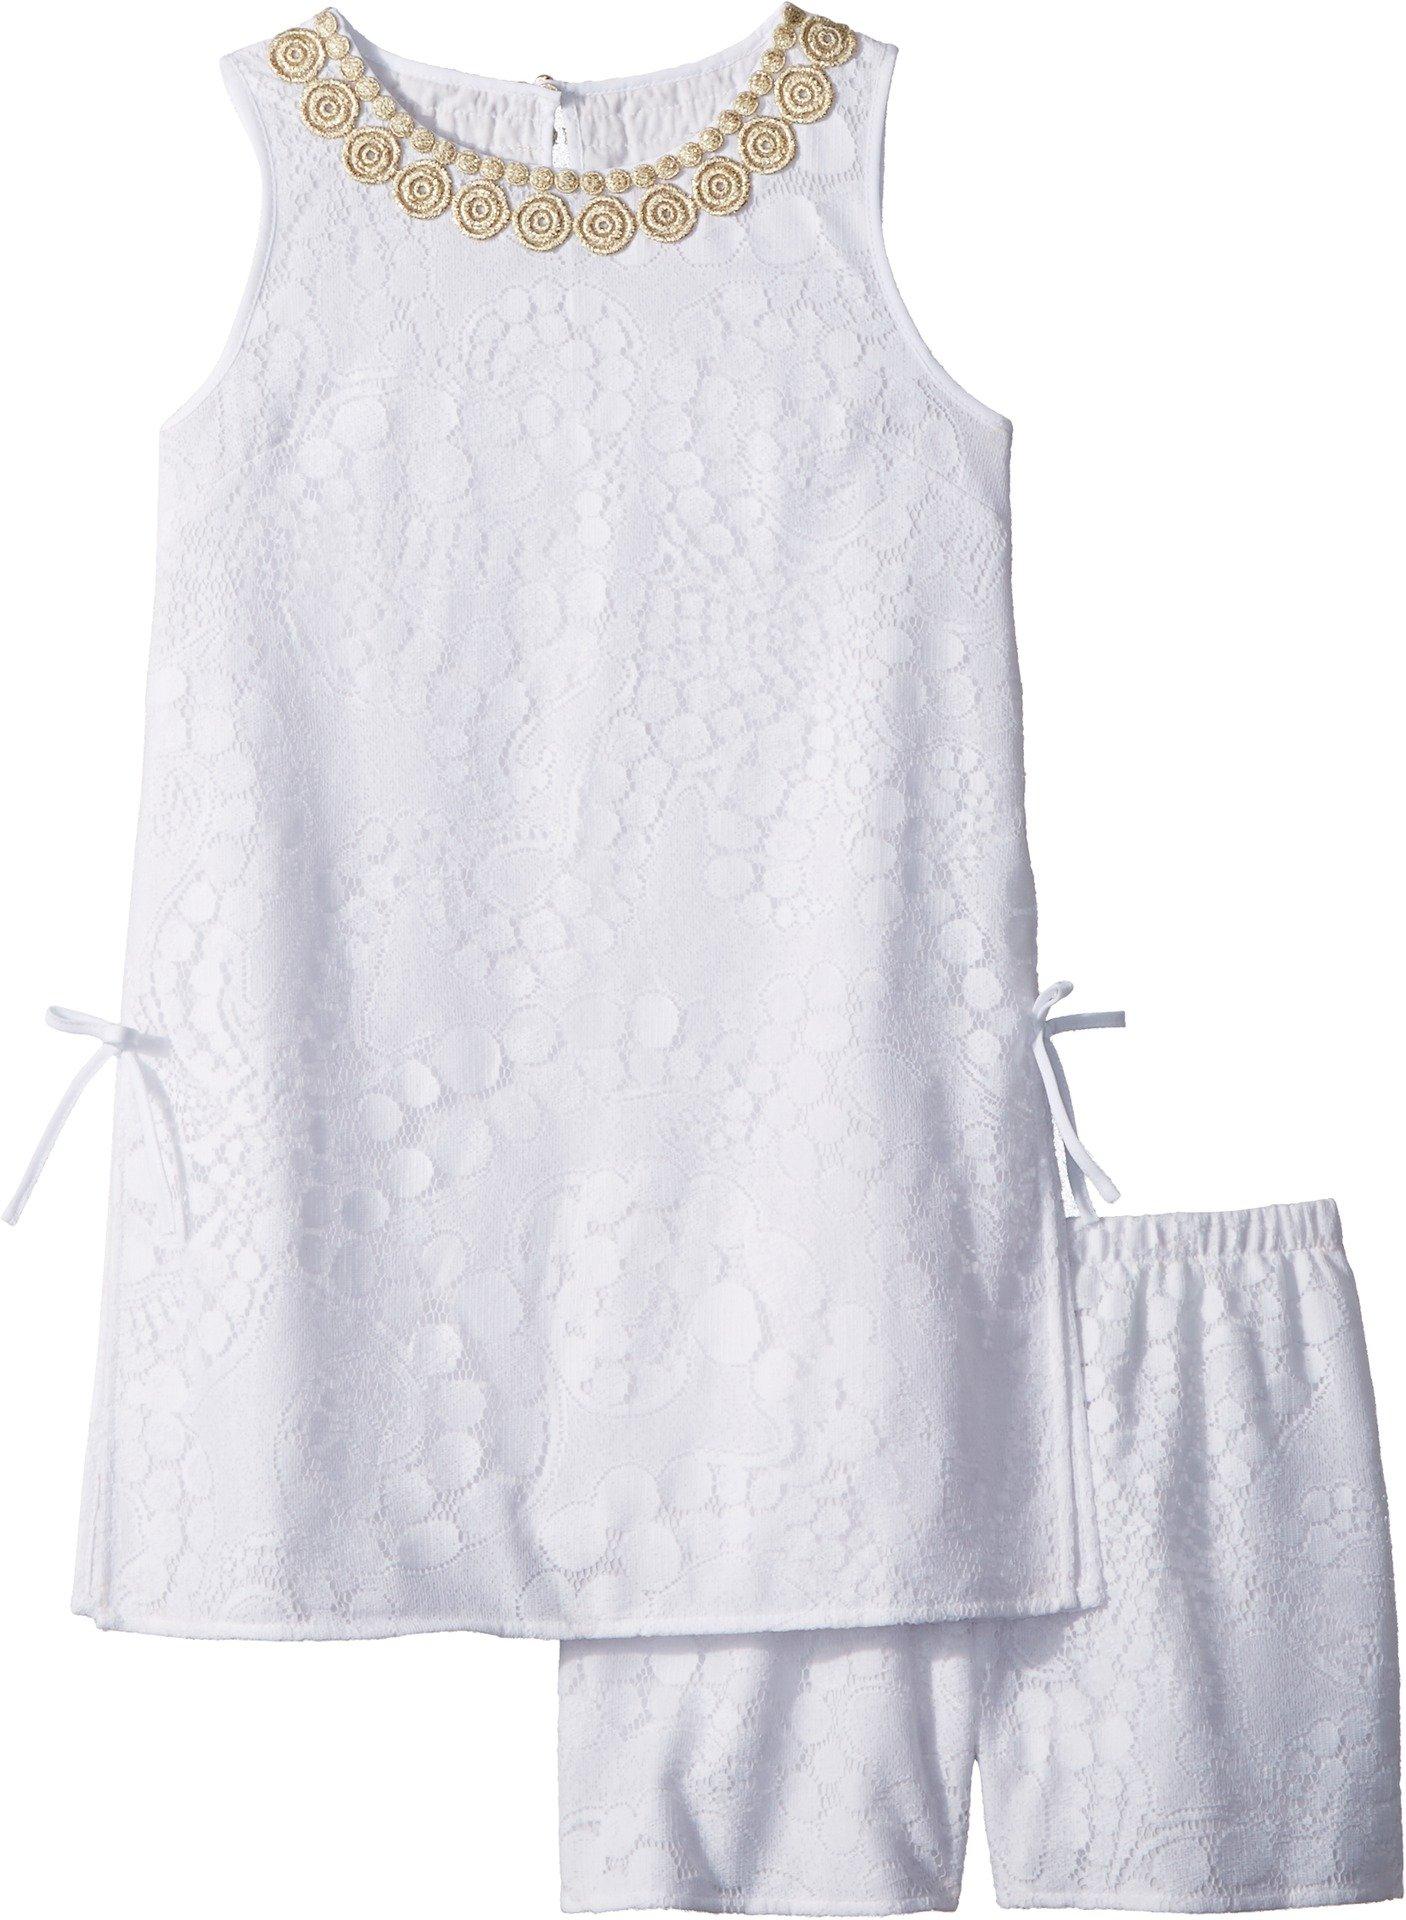 Lilly Pulitzer Kids Baby Girl's Mini Donna Set (Toddler/Little Kids/Big Kids) Resort White Mocean Lace 10